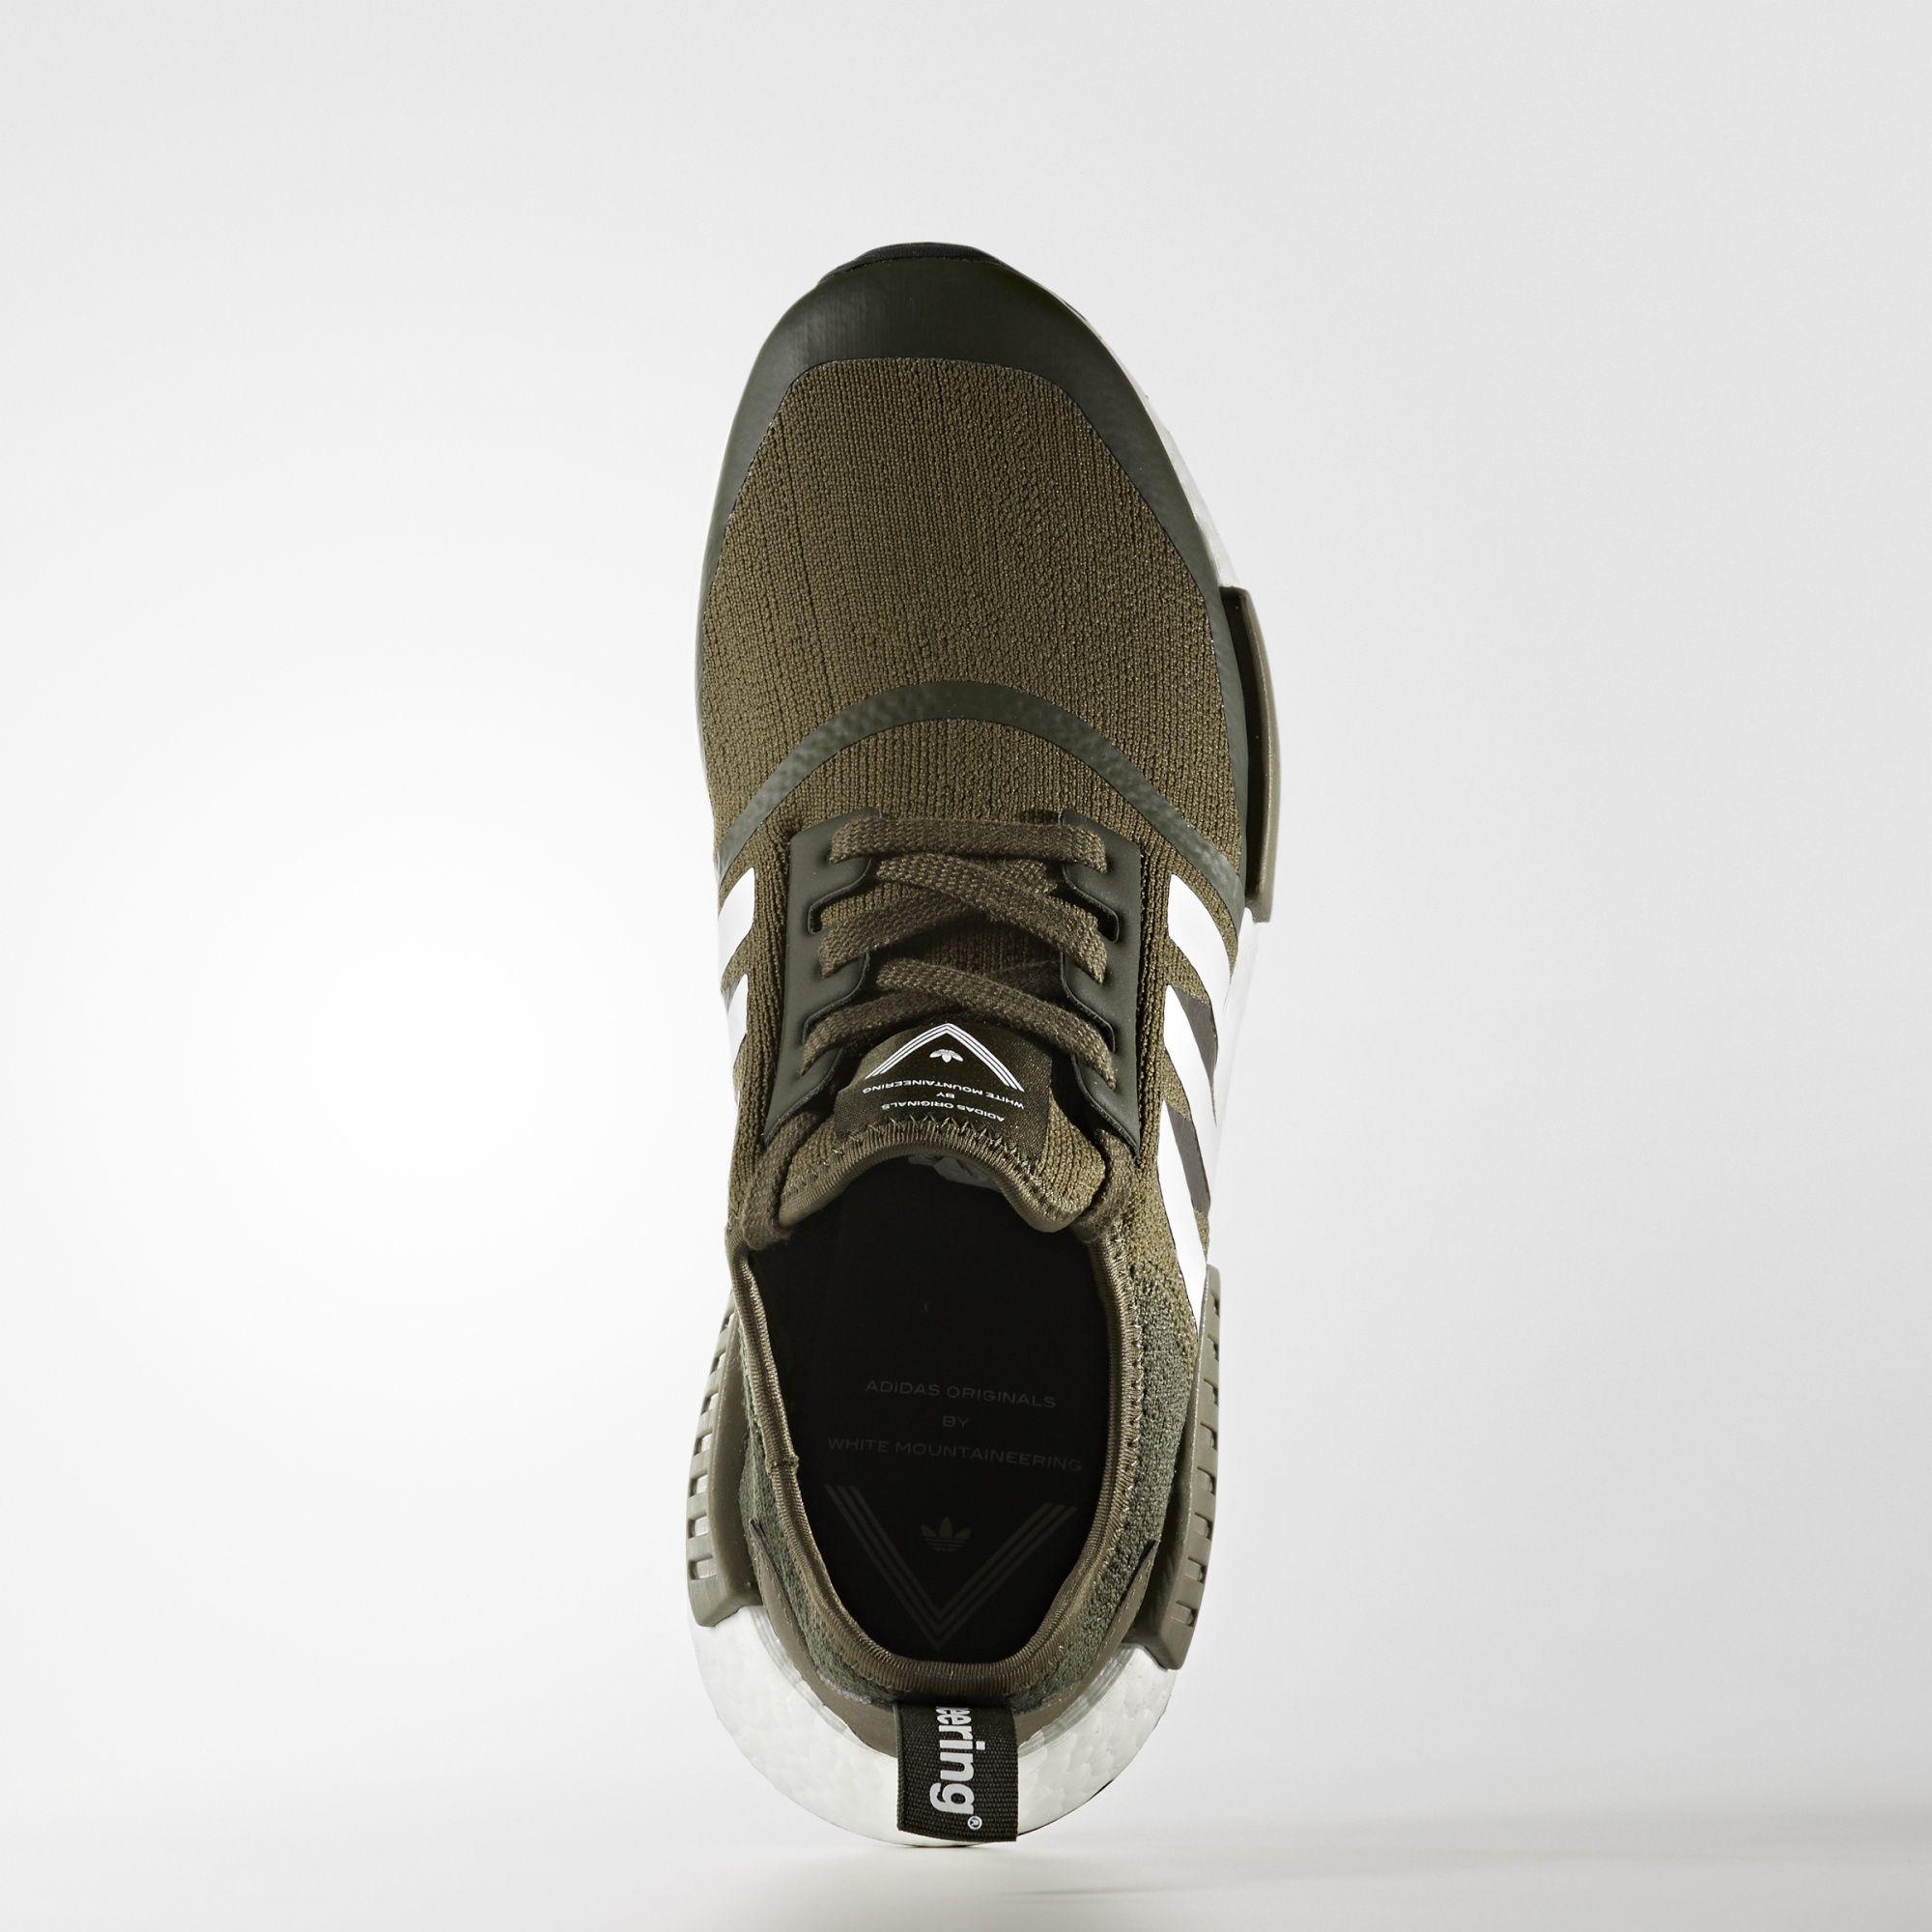 CG3647 White Mountaineering x adidas NMD R1 Trail Primeknit Olive 1